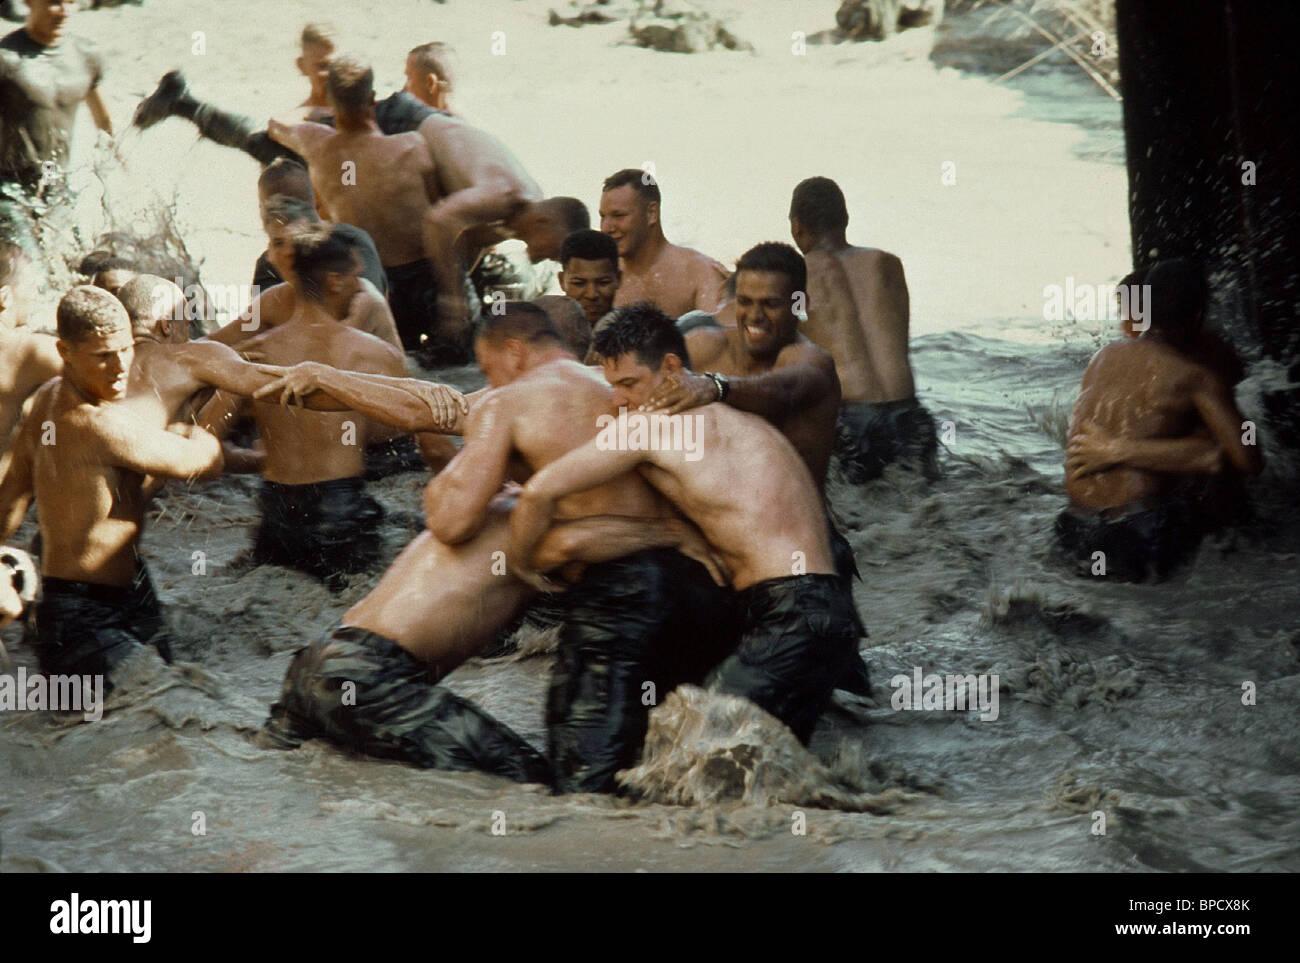 SOLDIERS IN MUDDY WATER SCENE HEARTBREAK RIDGE (1986) - Stock Image